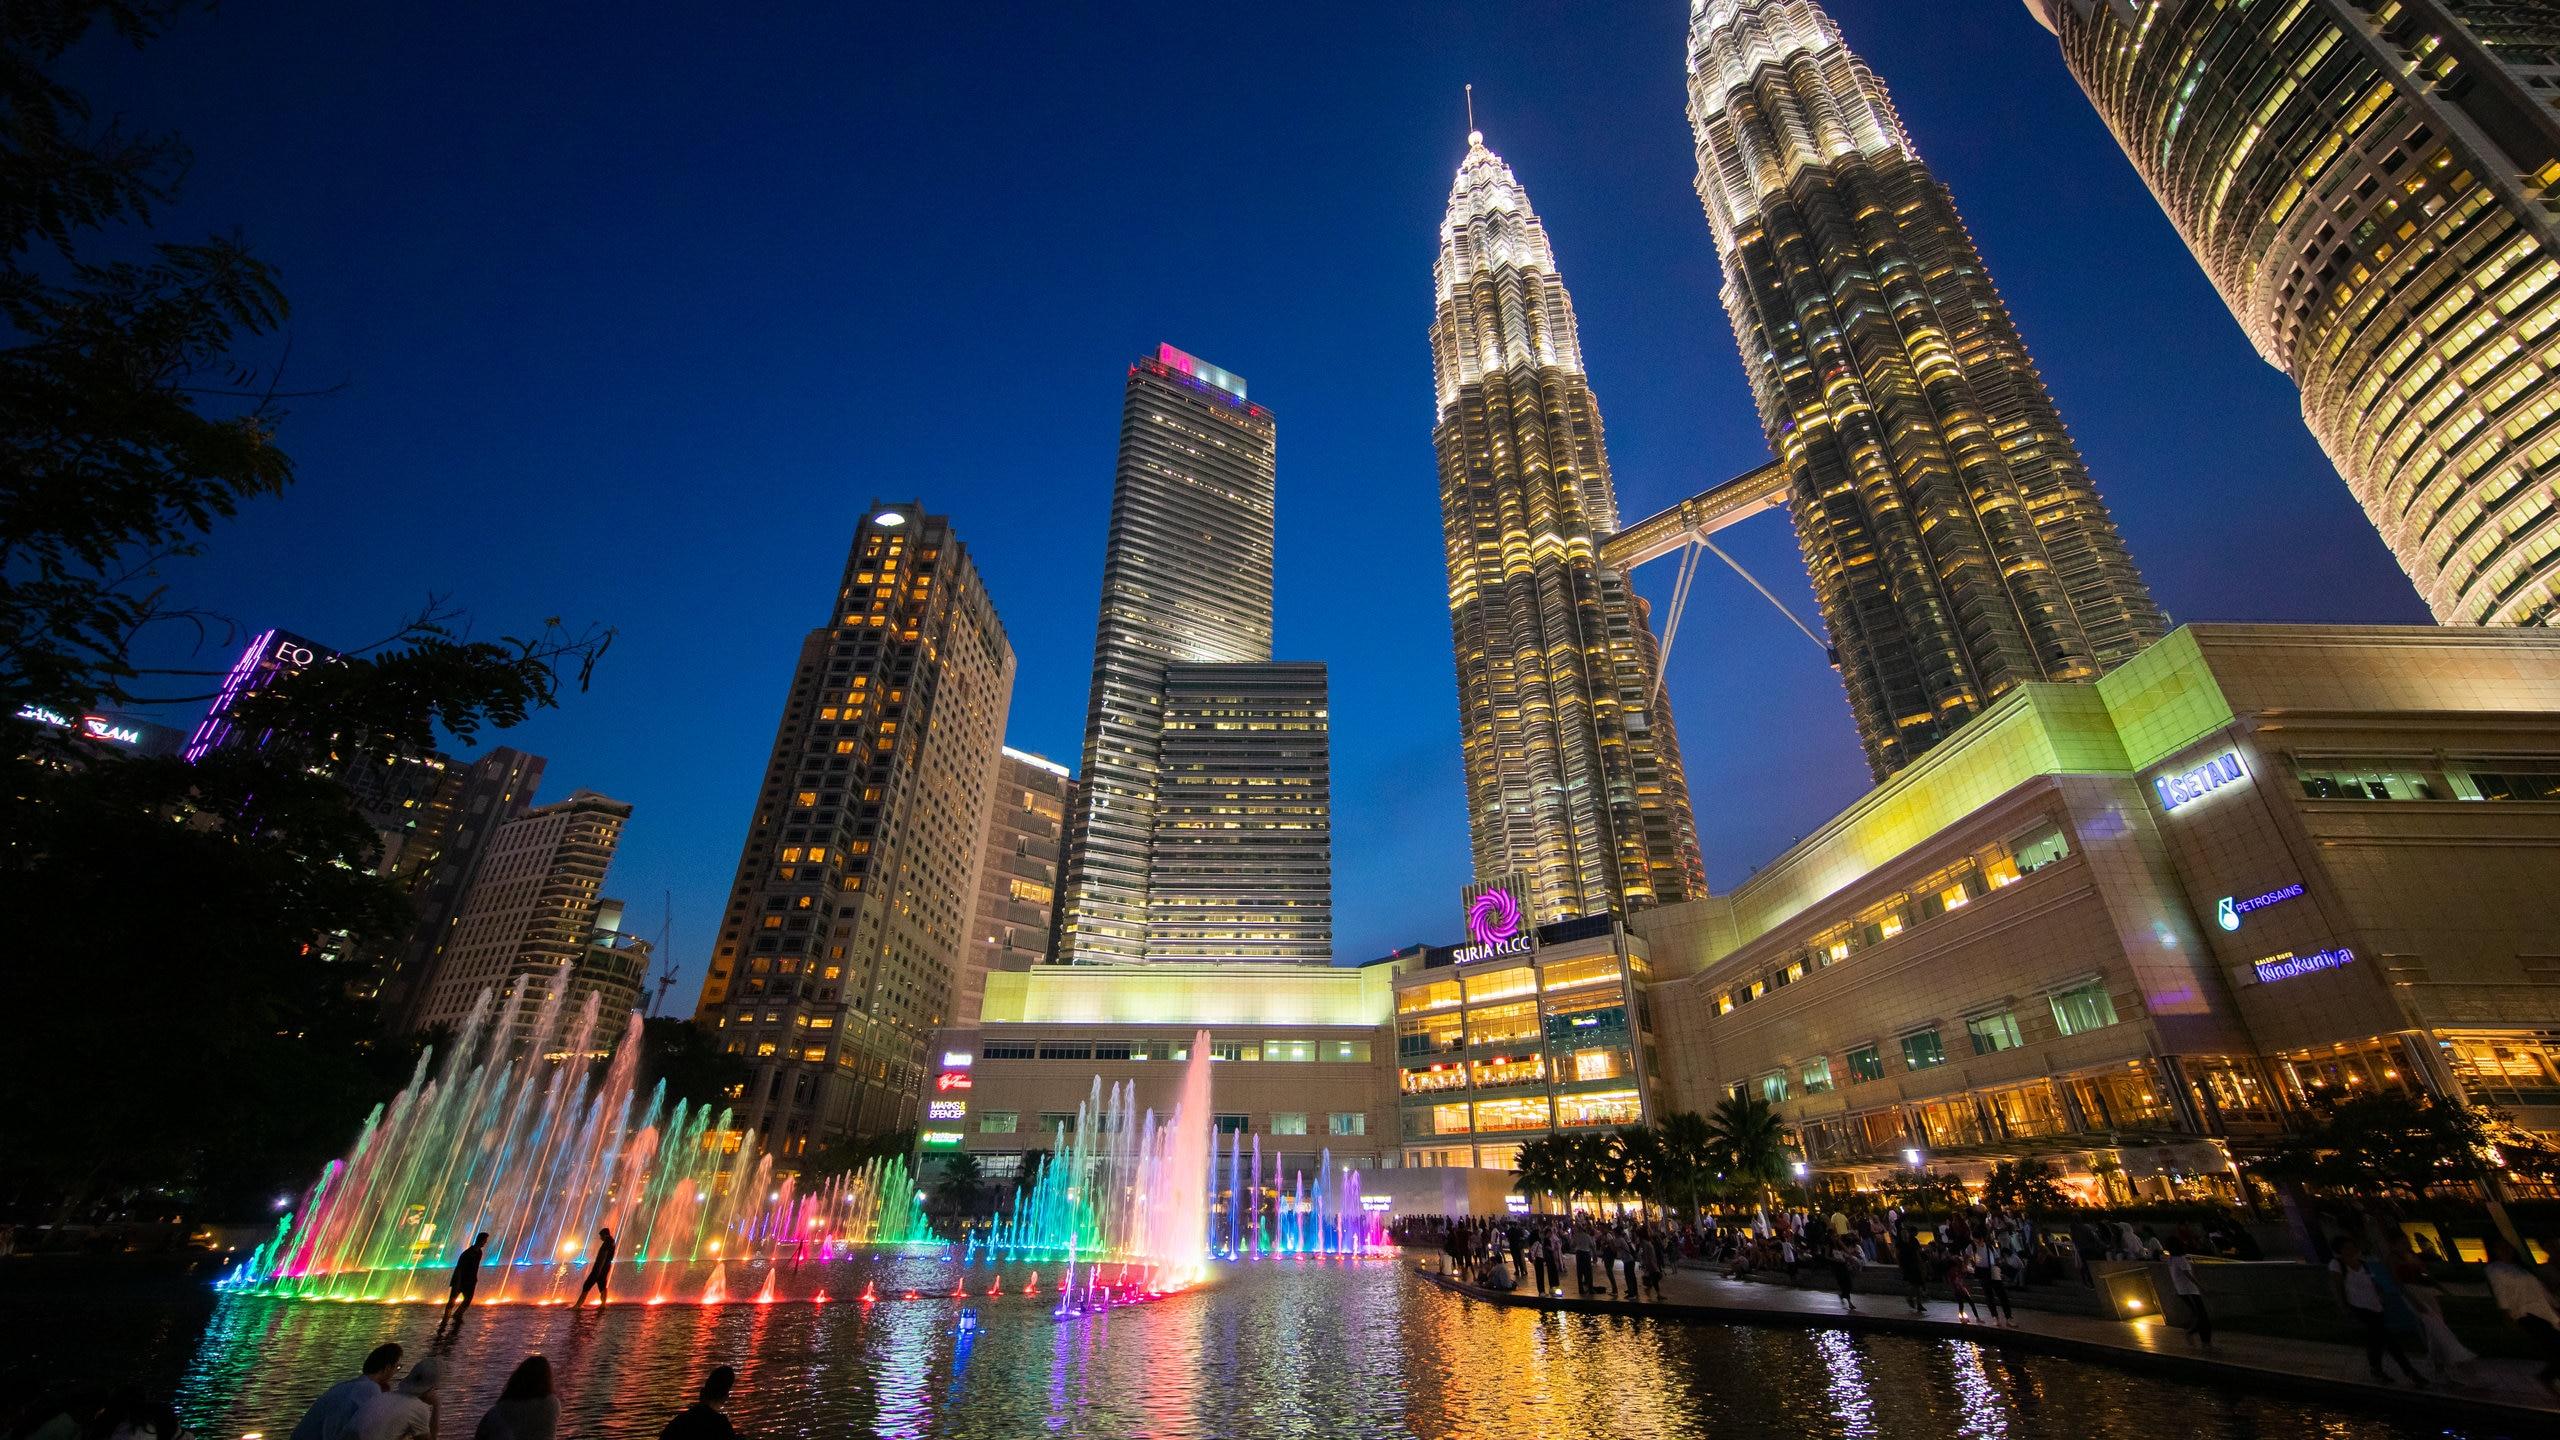 𝗧𝗢𝗣 𝟭𝟬 𝗛𝗼𝘁𝗲𝗹𝘀 𝗶𝗻 Kuala Lumpur (2020) | Expedia